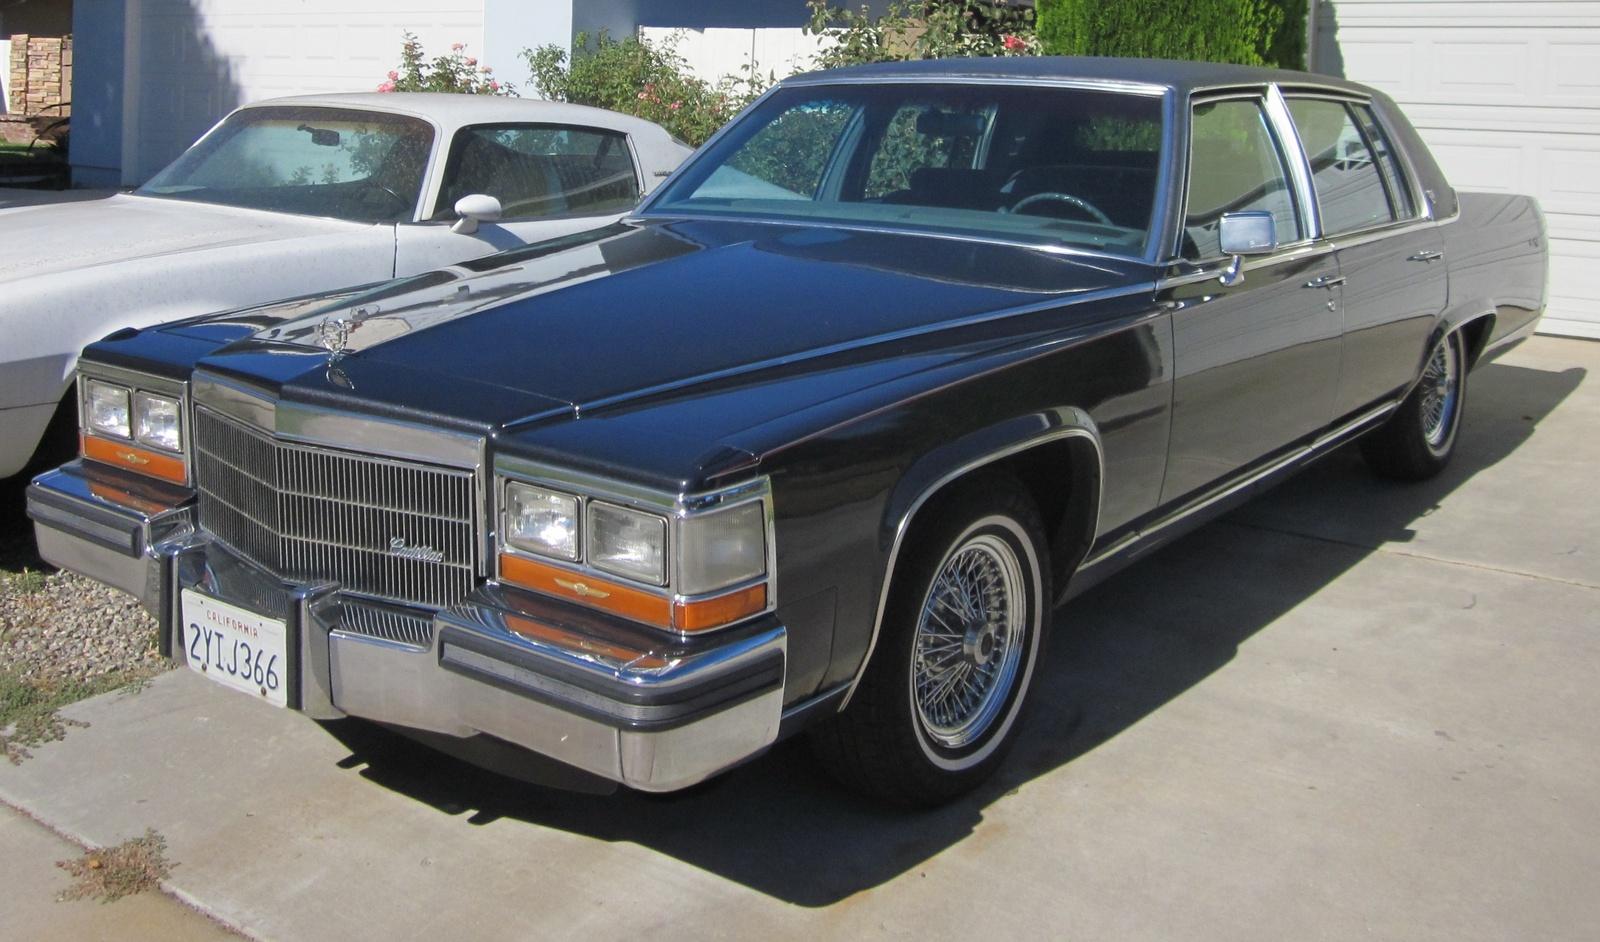 1987 Cadillac Brougham Overview Cargurus